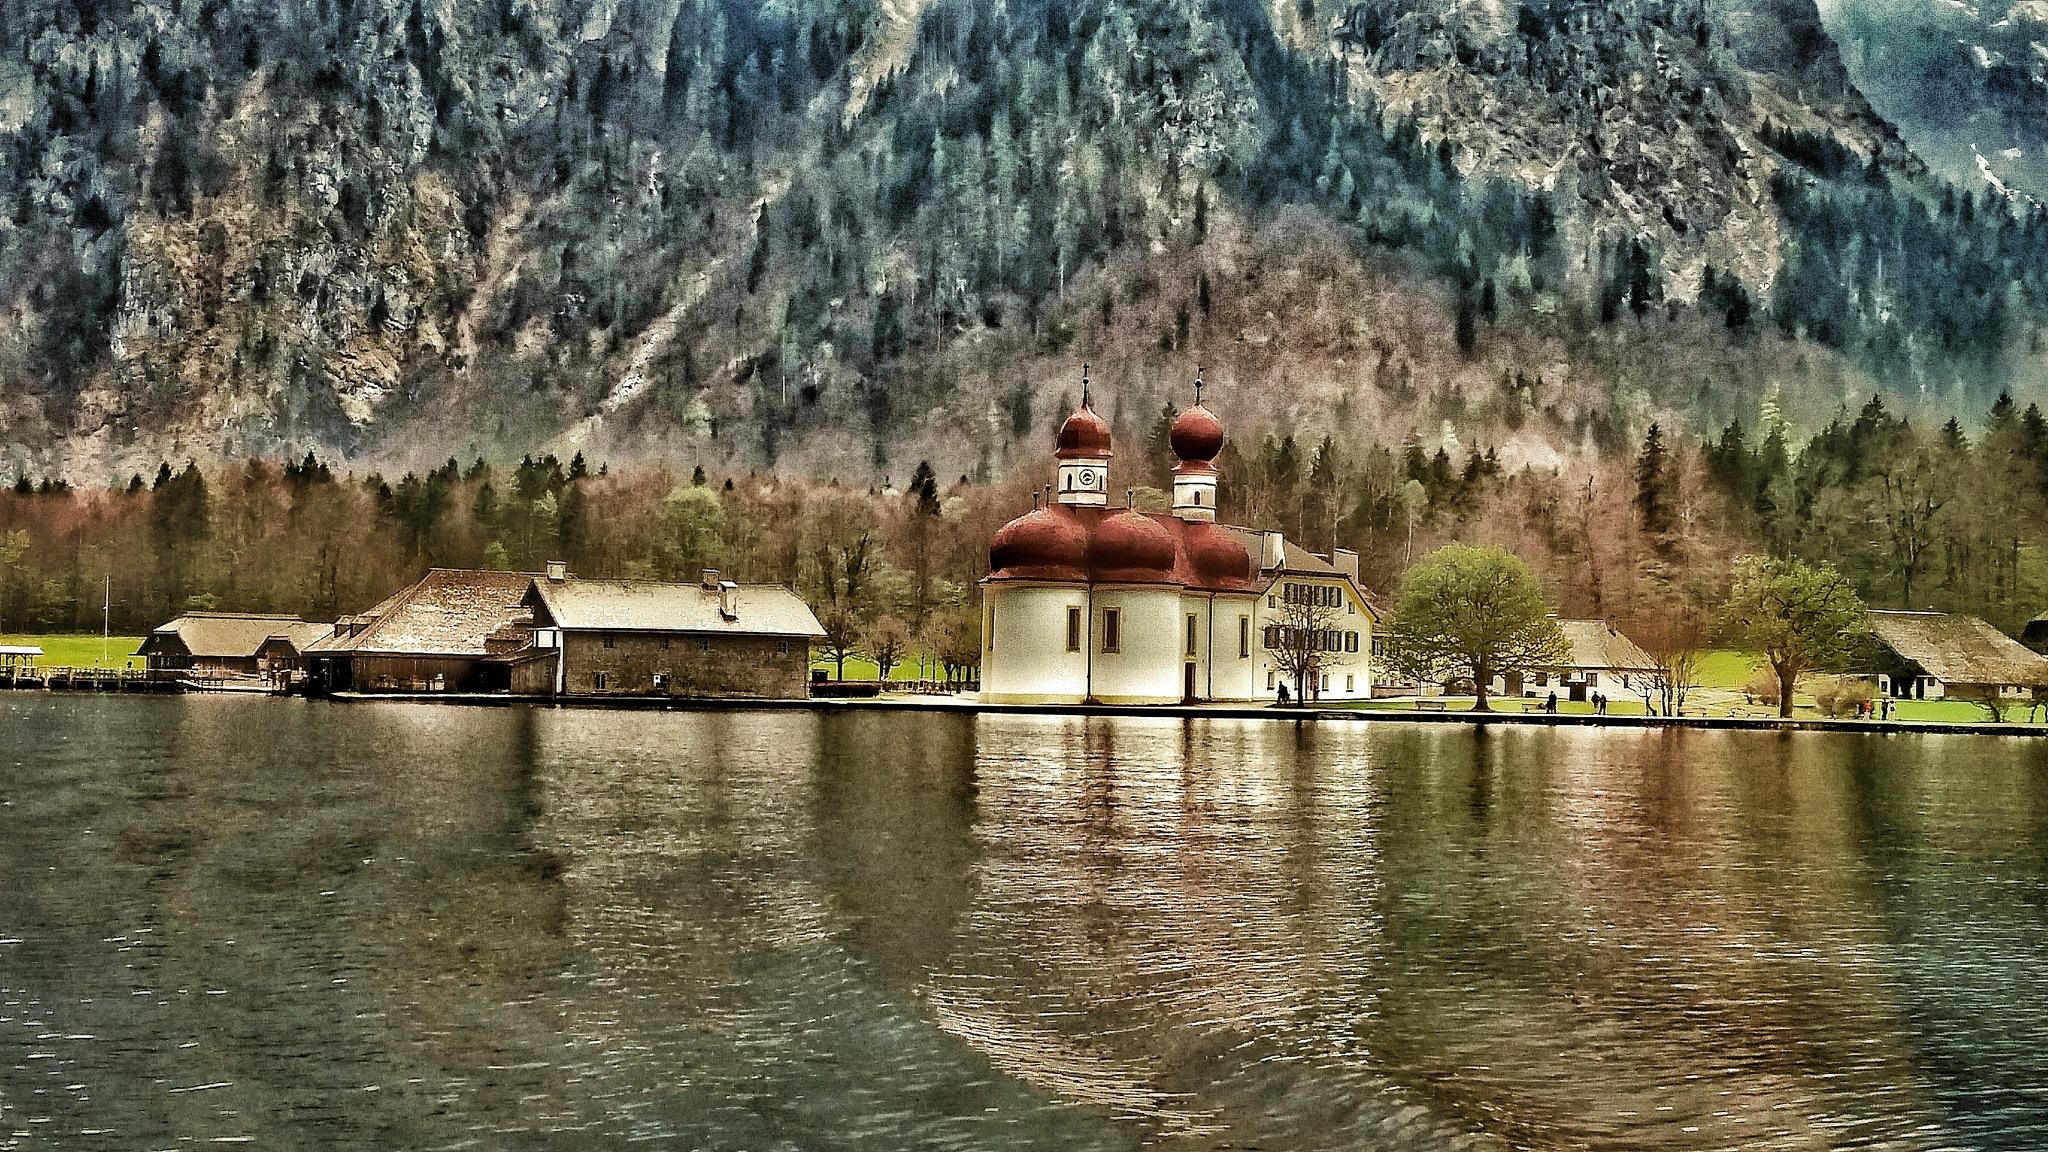 St. Bartholomew's Church on the Konnigssee by dave.skorupski